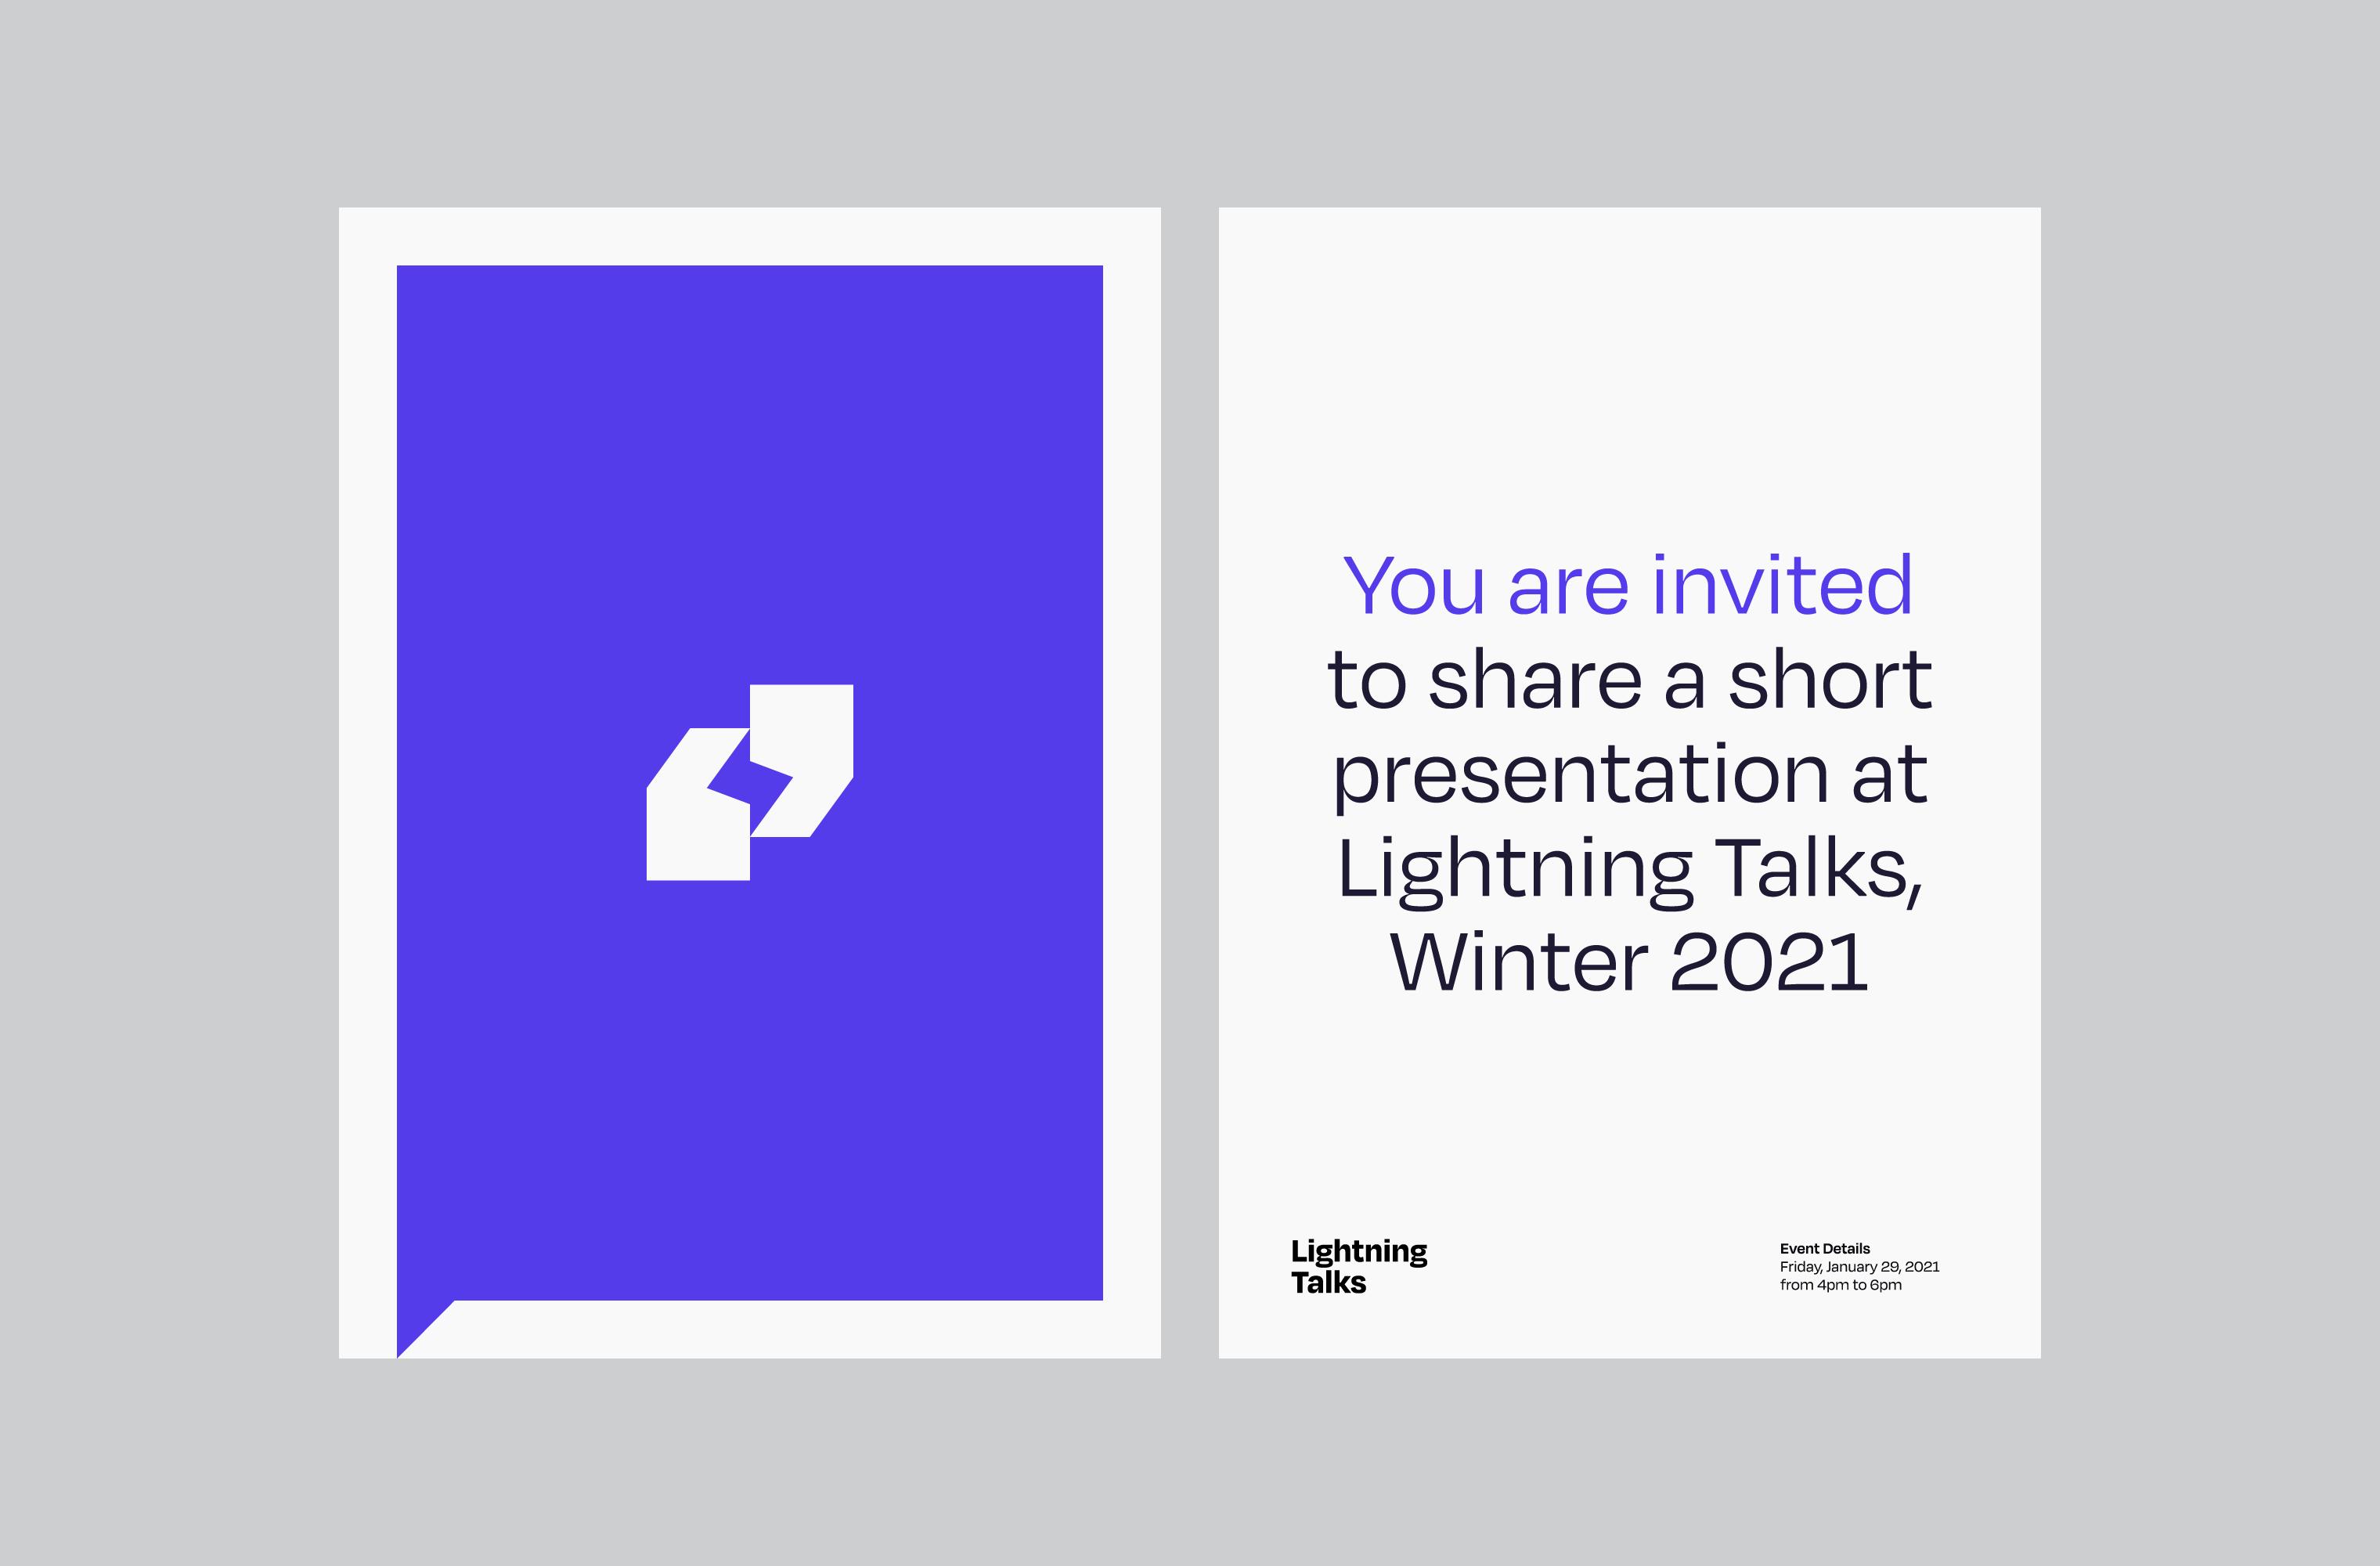 Invitation to speak at a Lightning Talks event